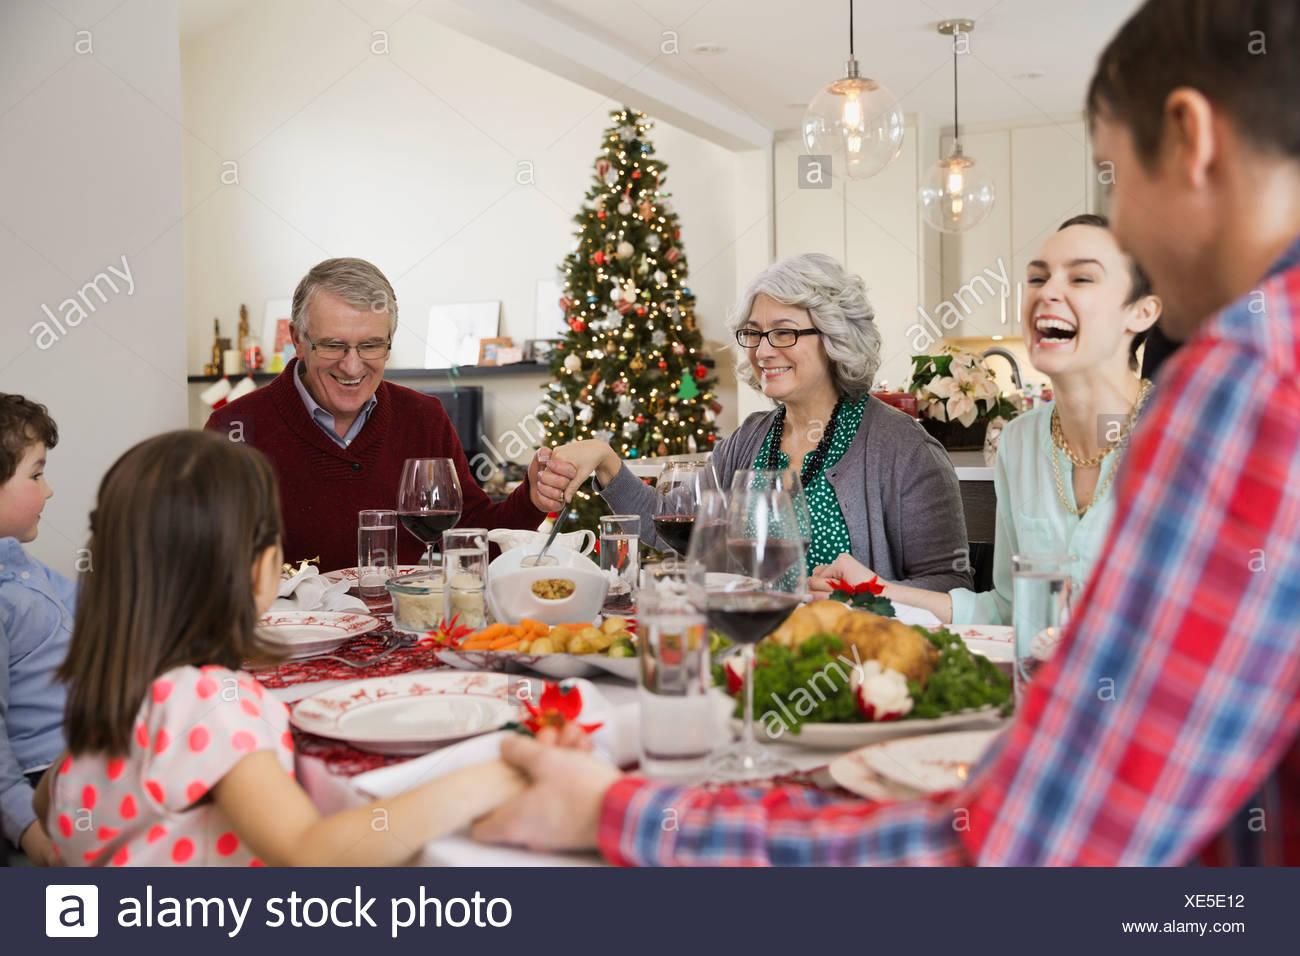 Multi-generation family saying grace before Christmas dinner - Stock Image